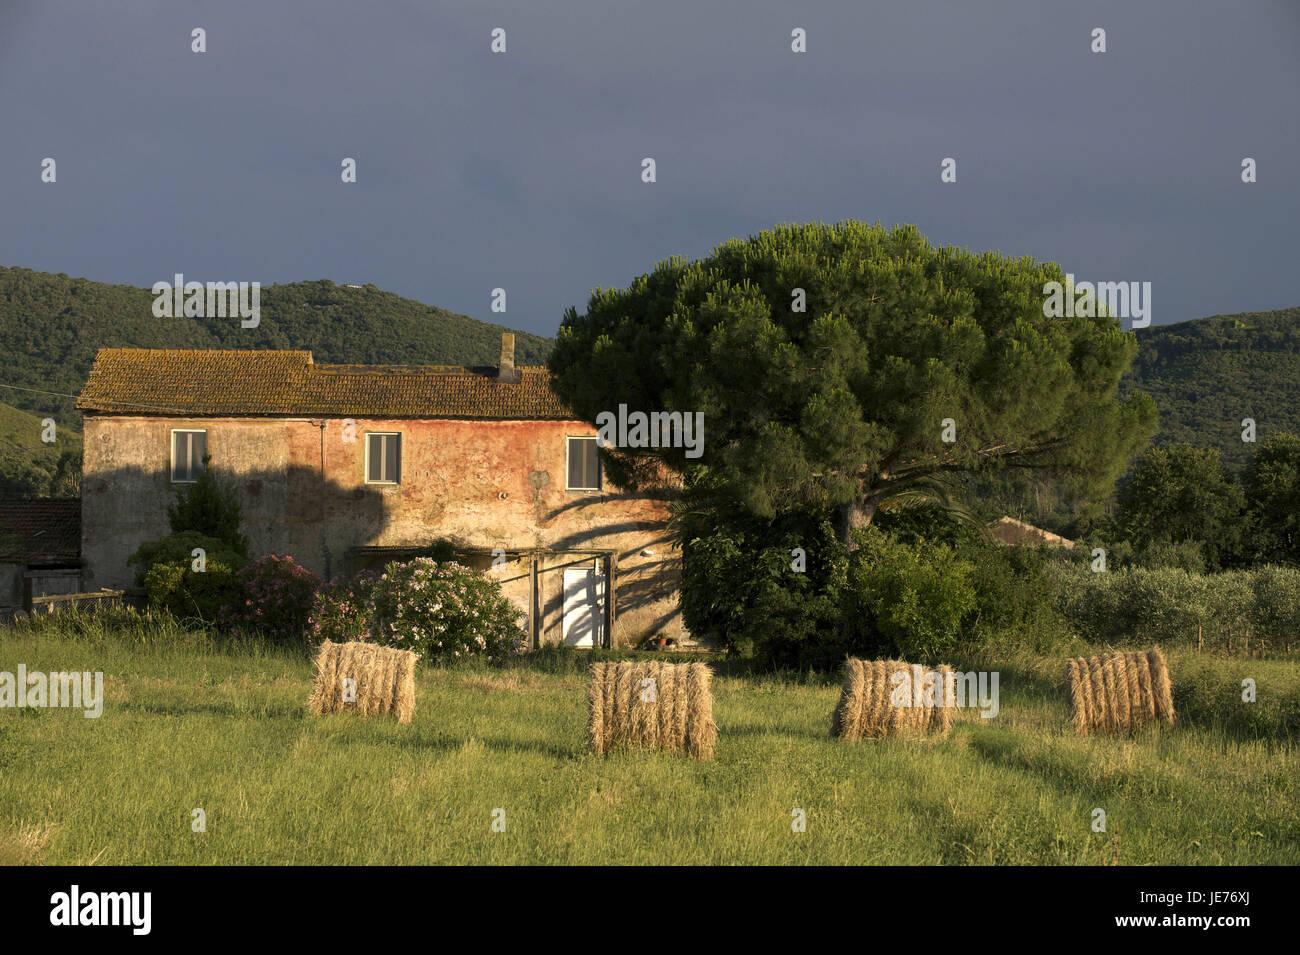 Italy, Tuscany, La Maremma, Monte Argentario, farmhouse, - Stock Image